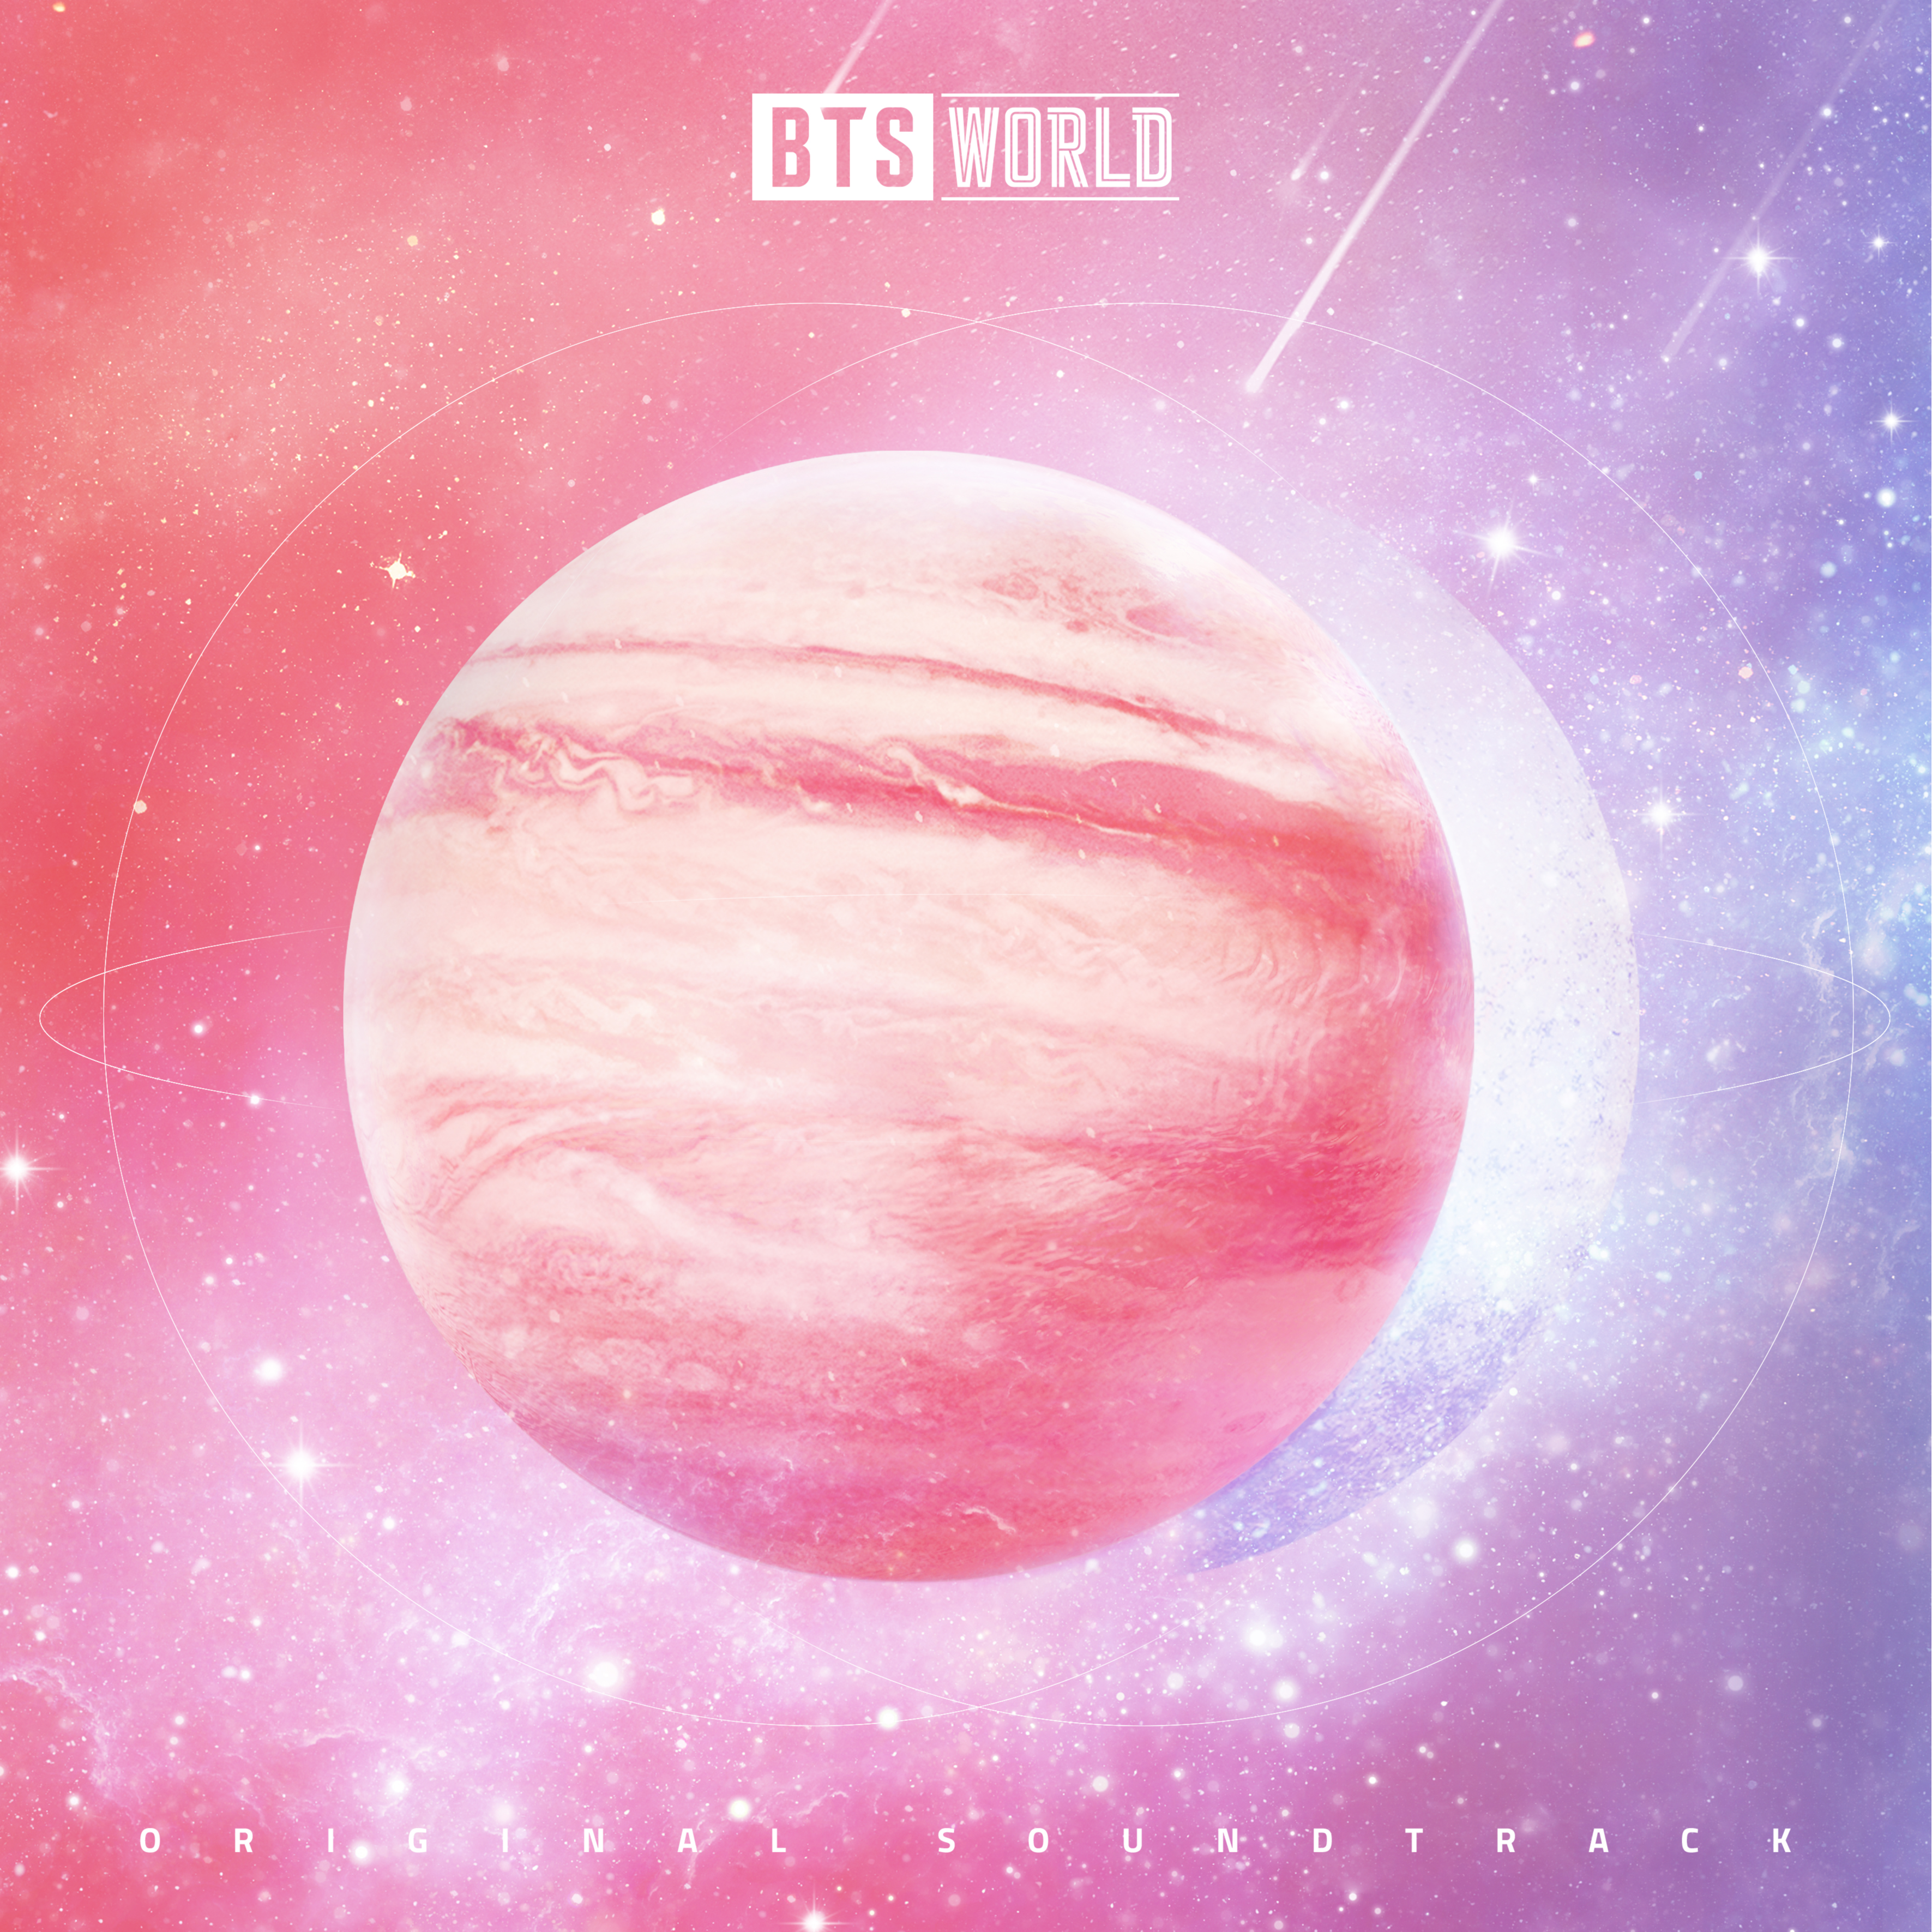 BTS WORLD OST